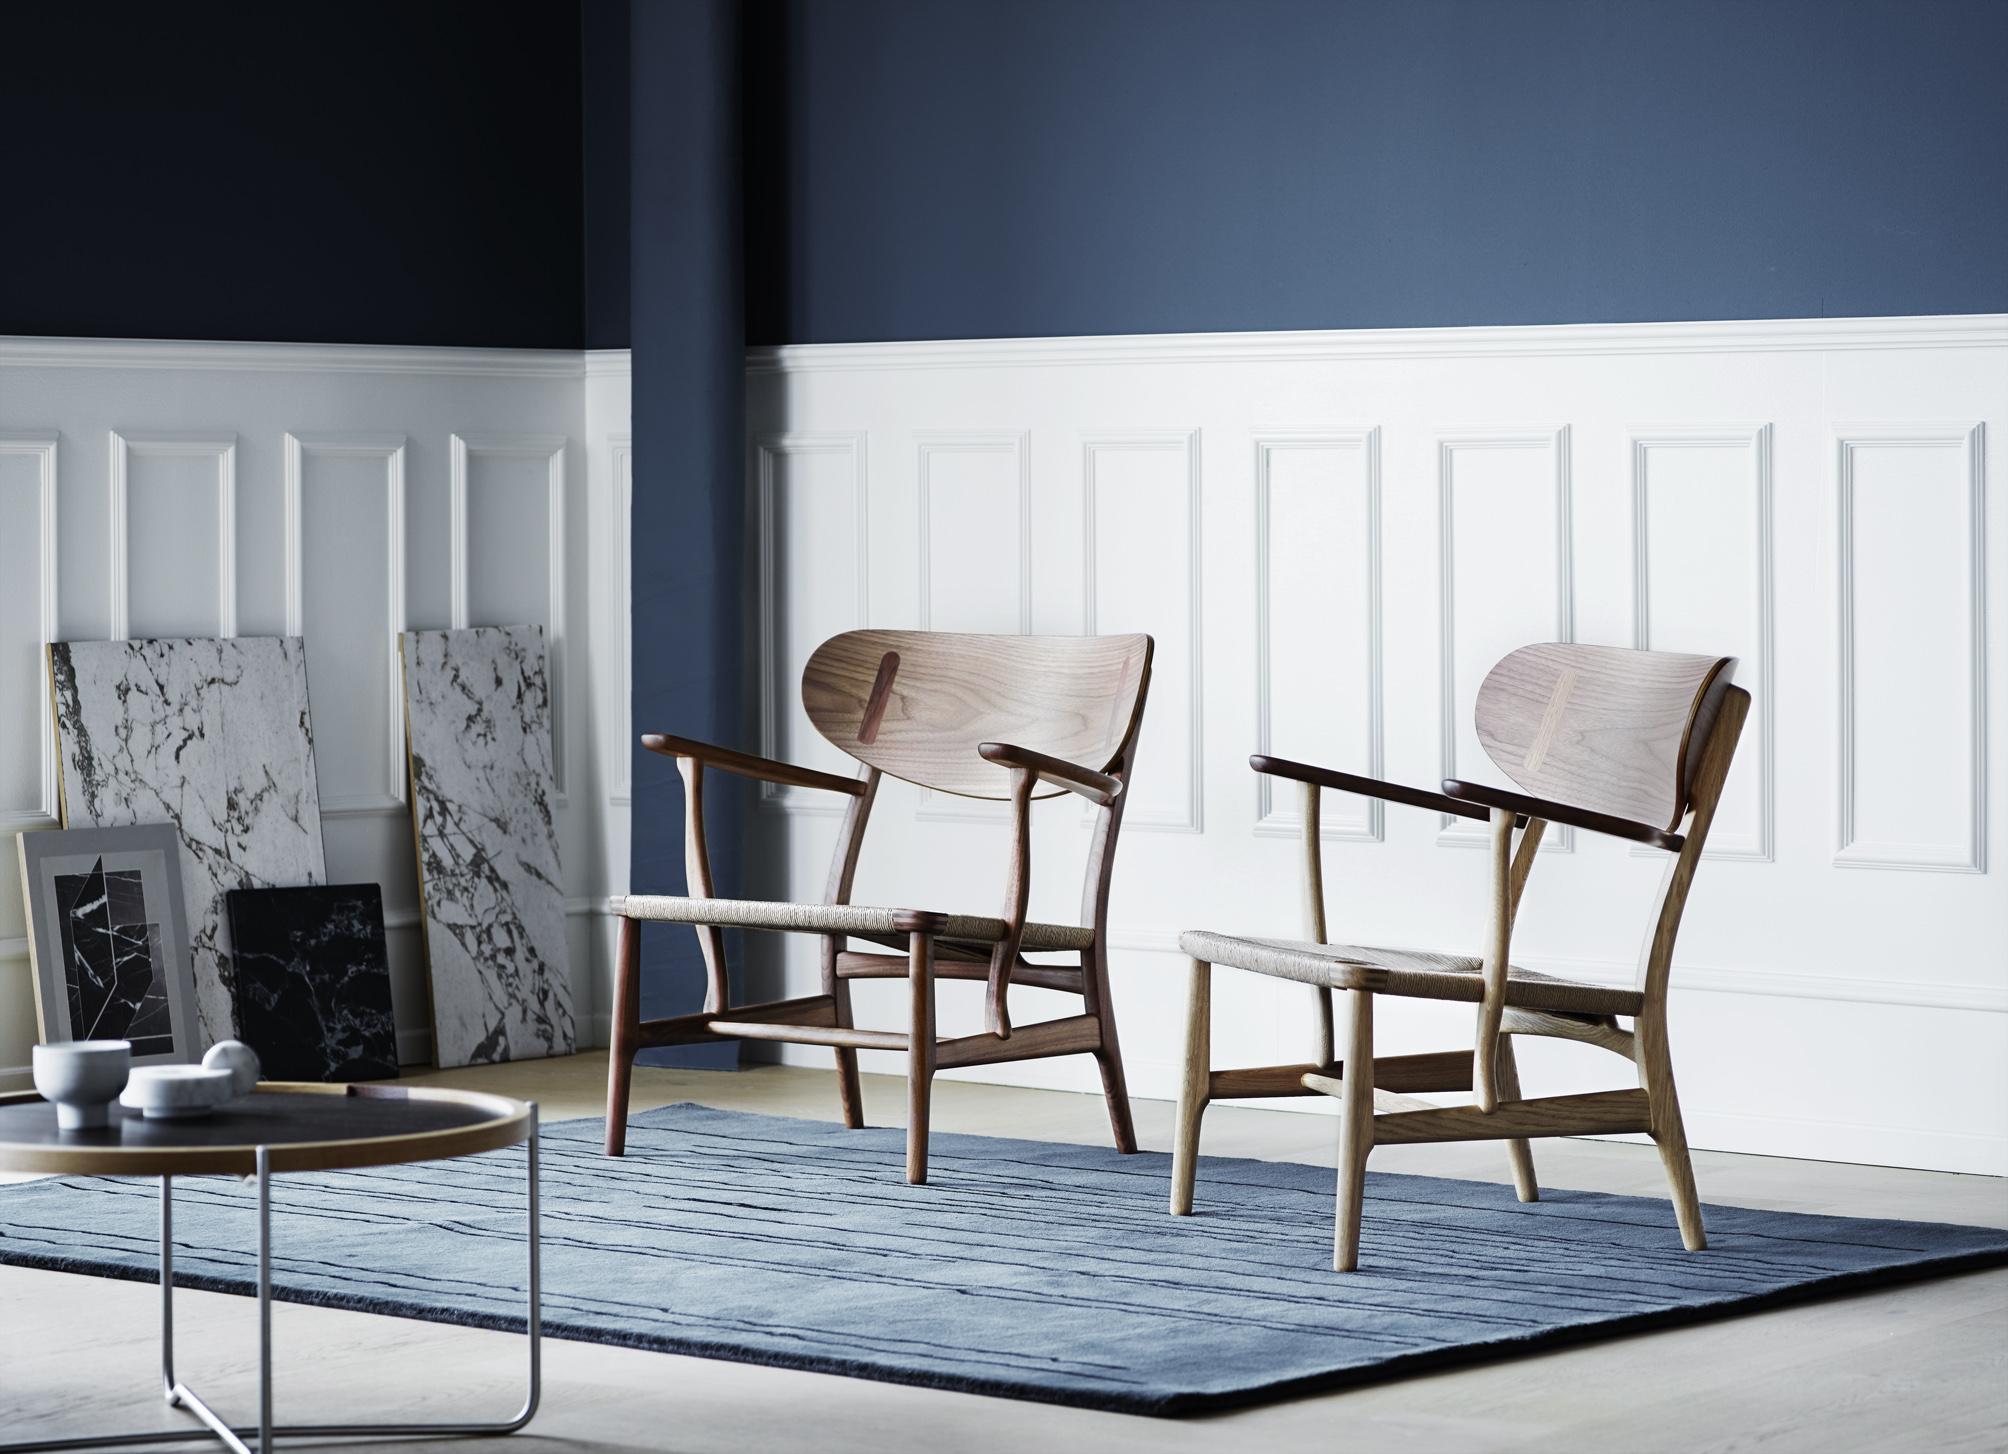 Relansering av Hans J. Wegners CH 22 loungestol (CH 26 spisebordstol)